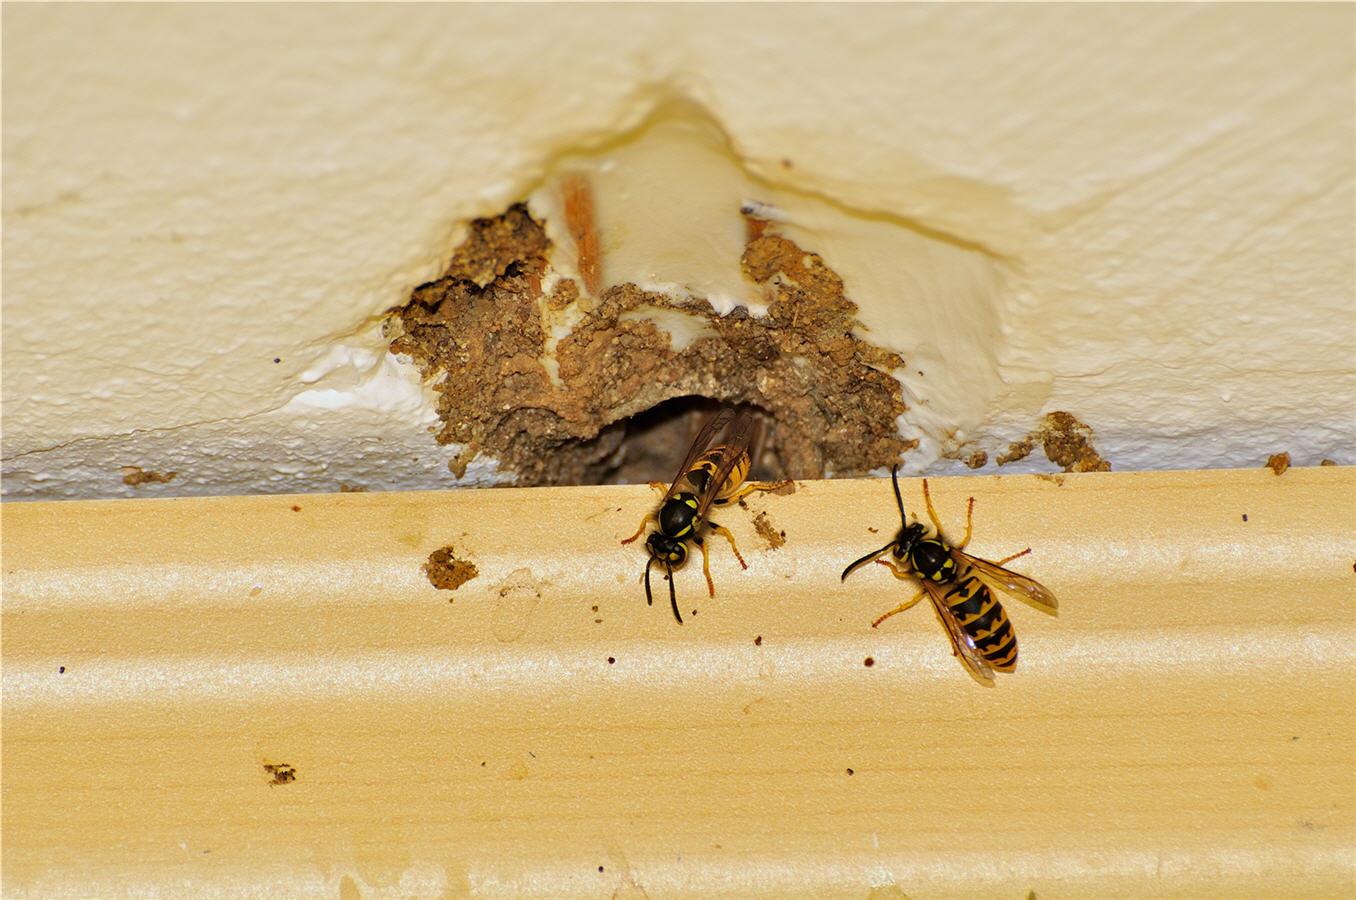 wasps penetrate brick work